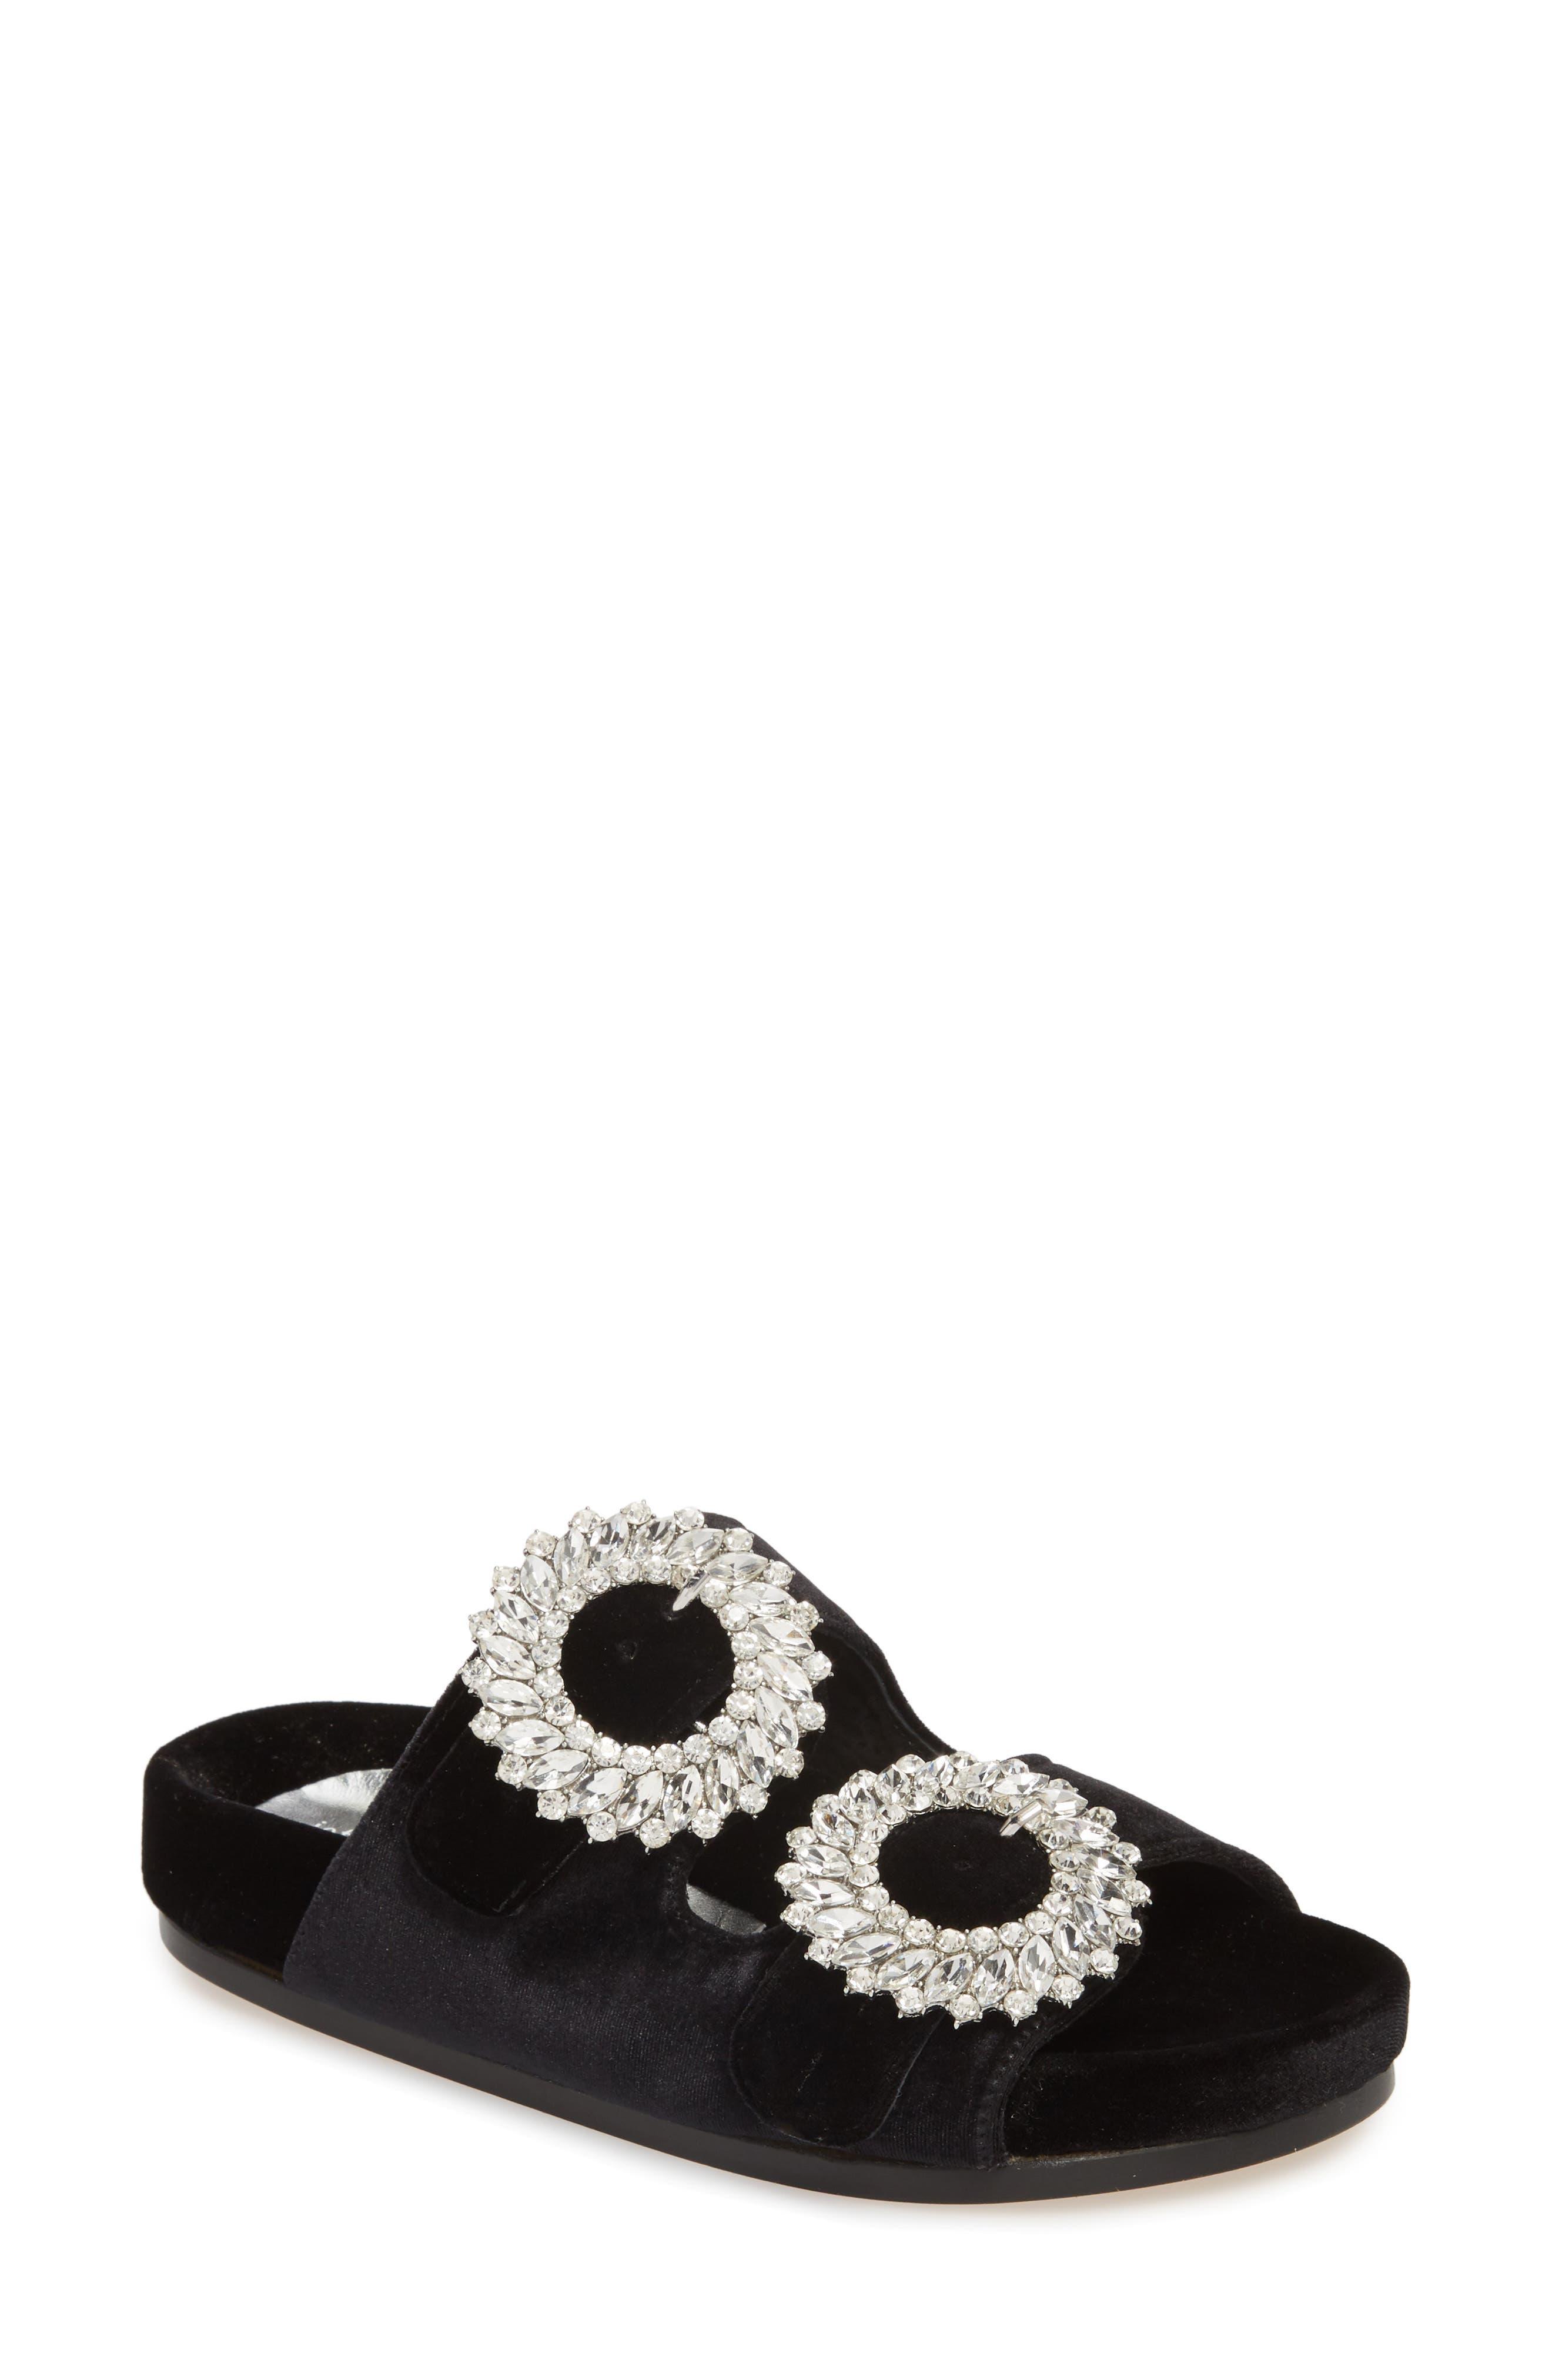 Izaro Embellished Slide Sandal,                         Main,                         color, Black Velvet/ Silver